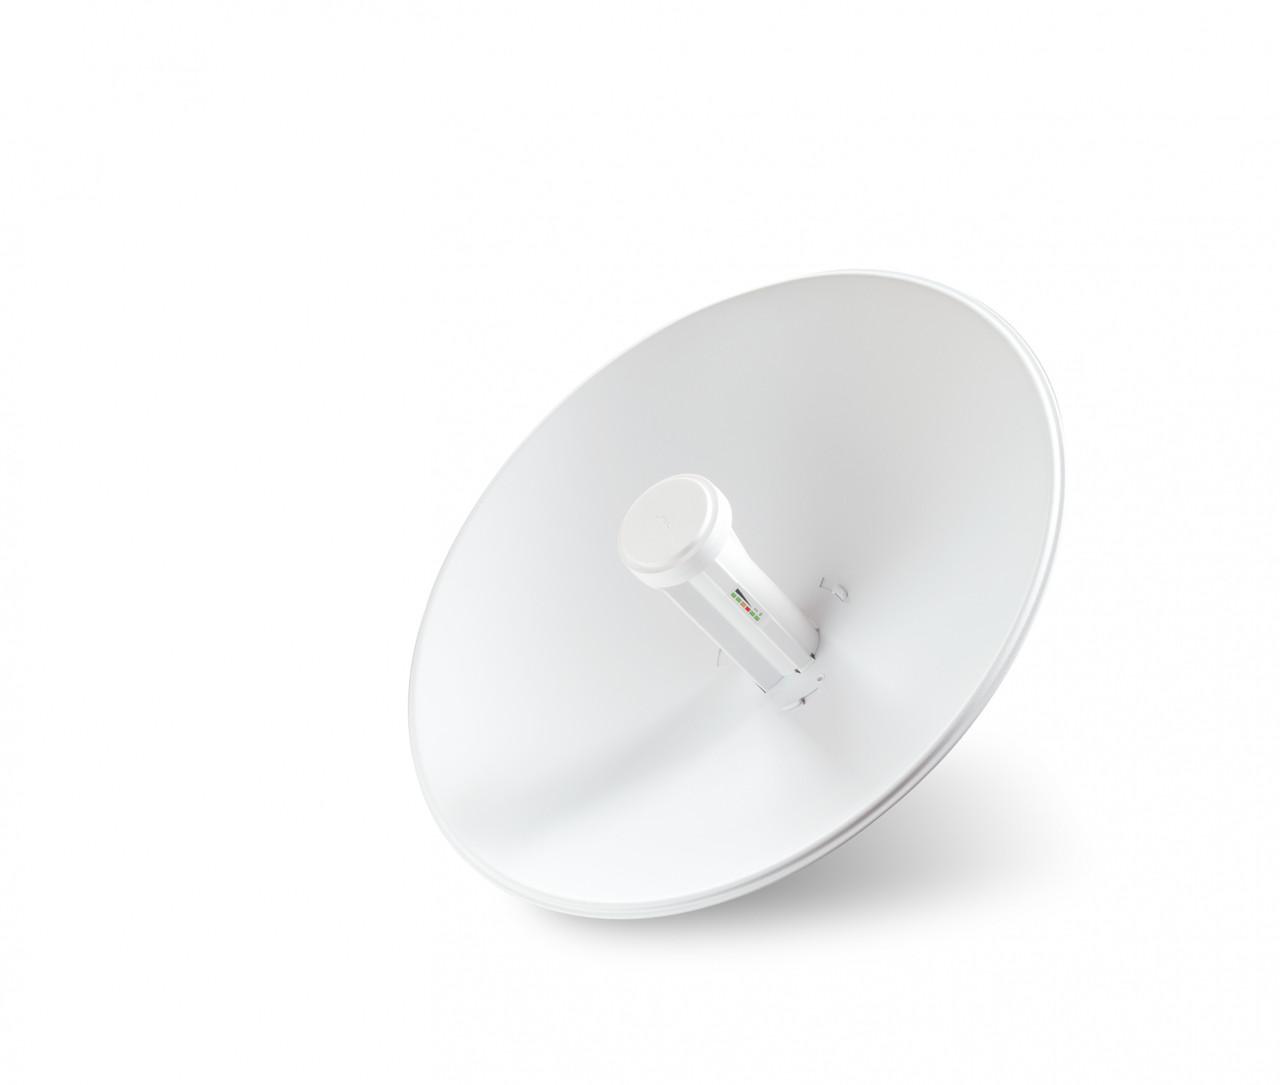 Радиомост Wi-Fi Ubiquiti PBE-M5-400 5 GHz PowerBeam, airMAX, 400 mm